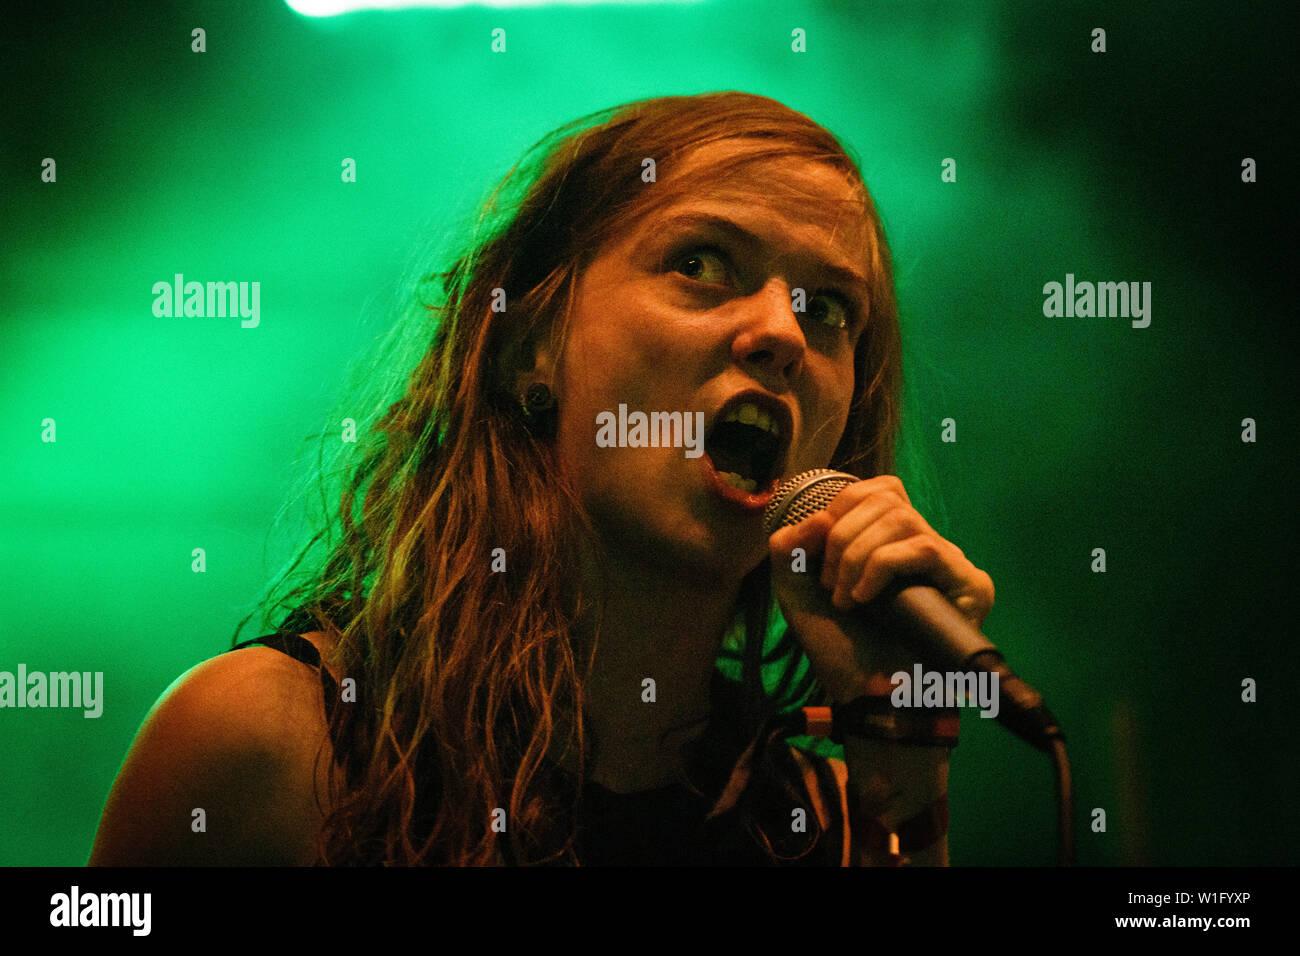 Roskilde, Denmark  July 1st, 2019  The Danish extreme metal